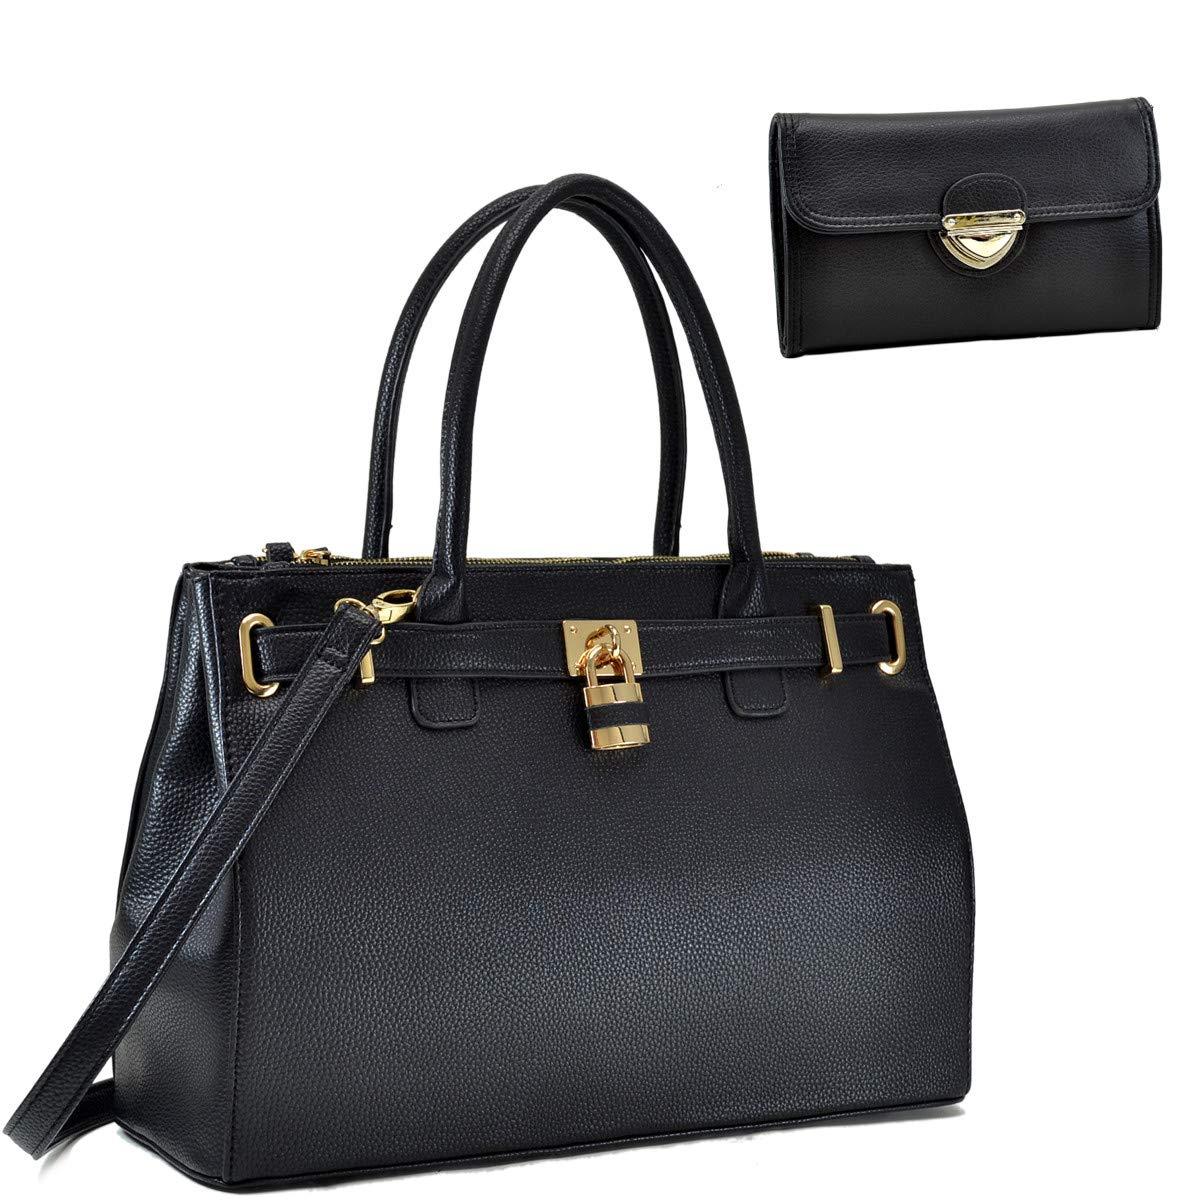 Dasein Women's Top Handle Satchel Handbags Tote Designer Purse Padlock Shoulder Bag